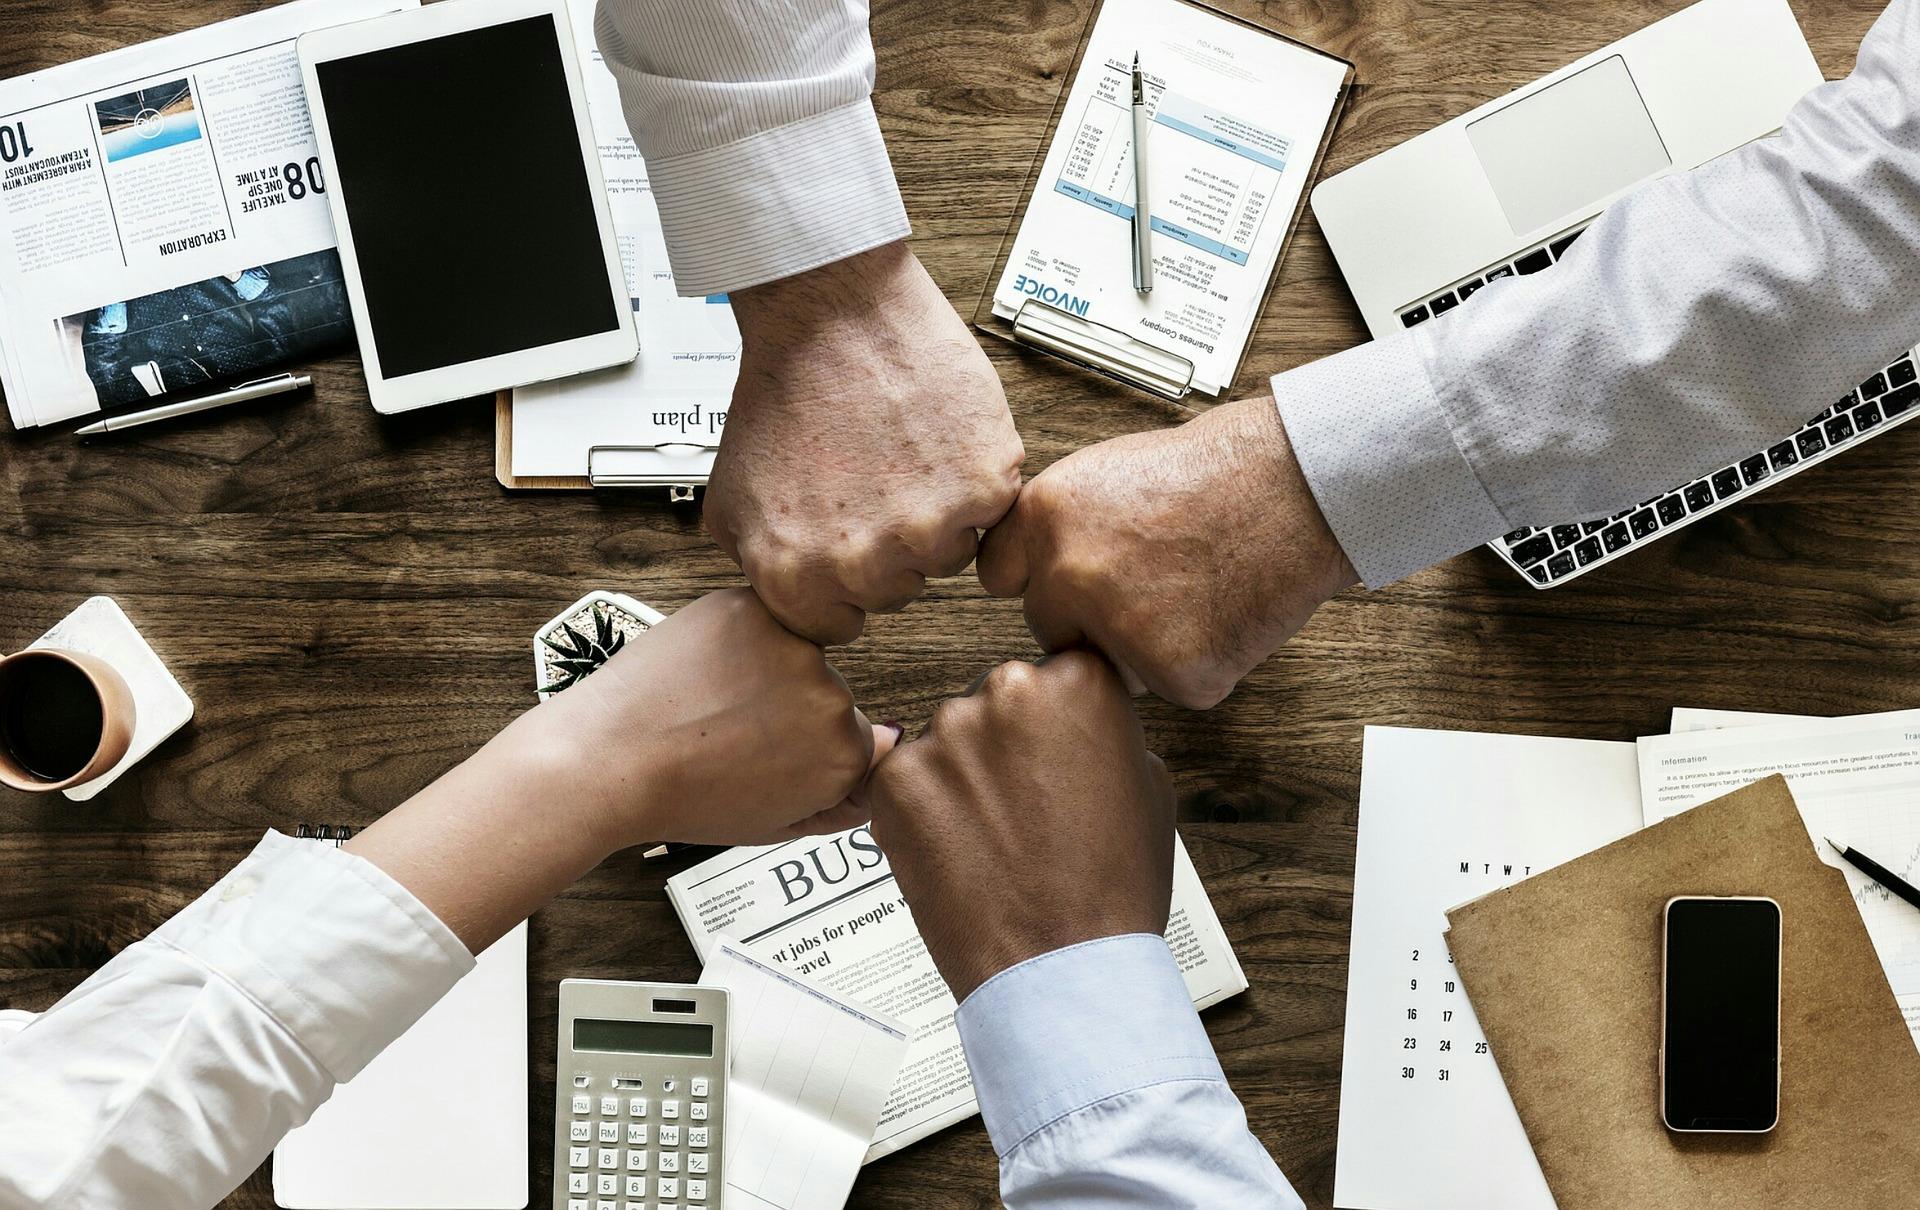 Effective Team Leadership: Where to Begin?